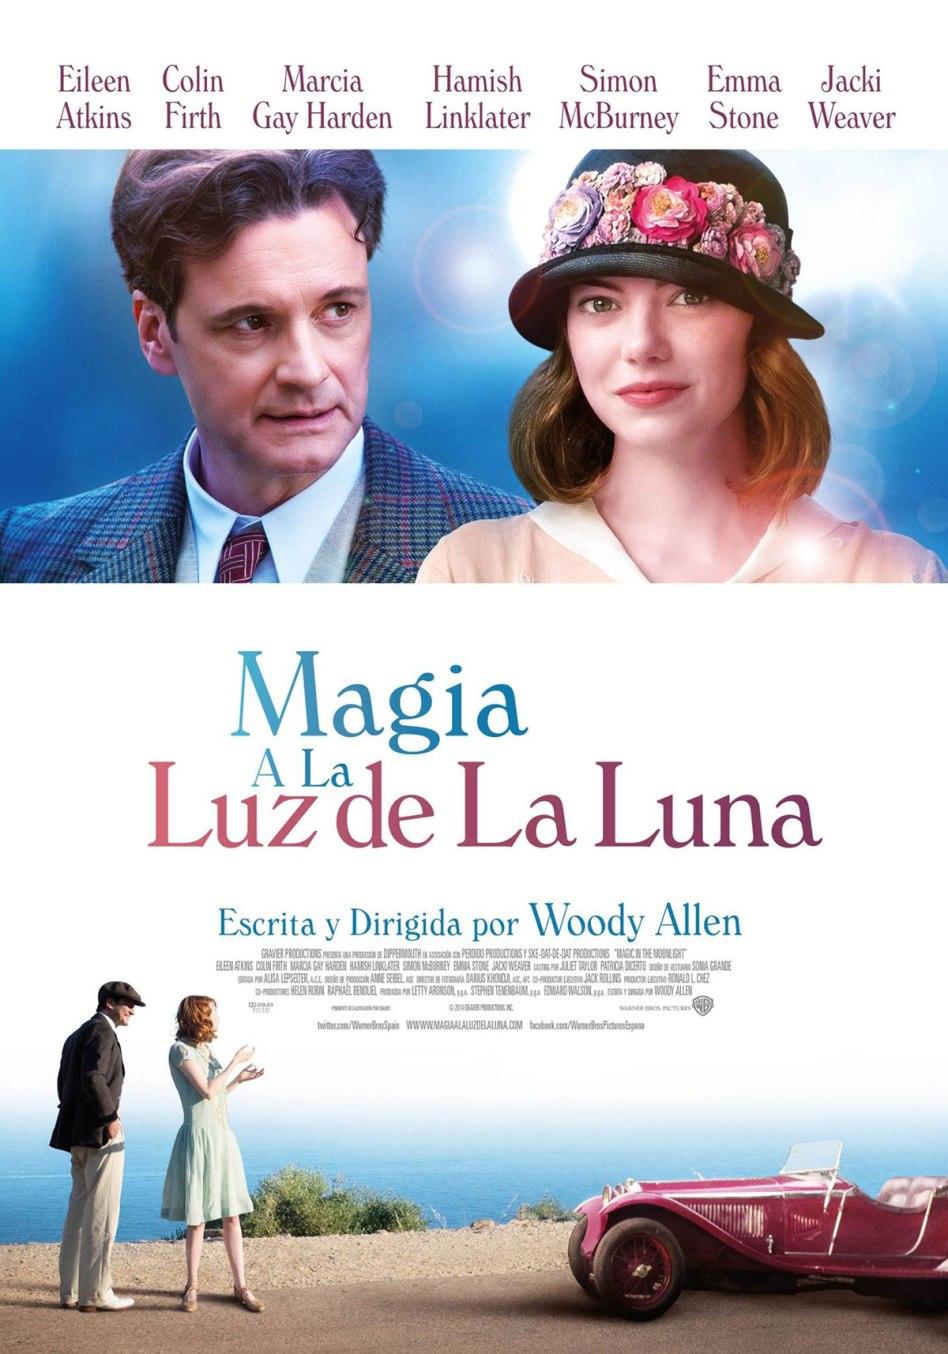 Magia poster